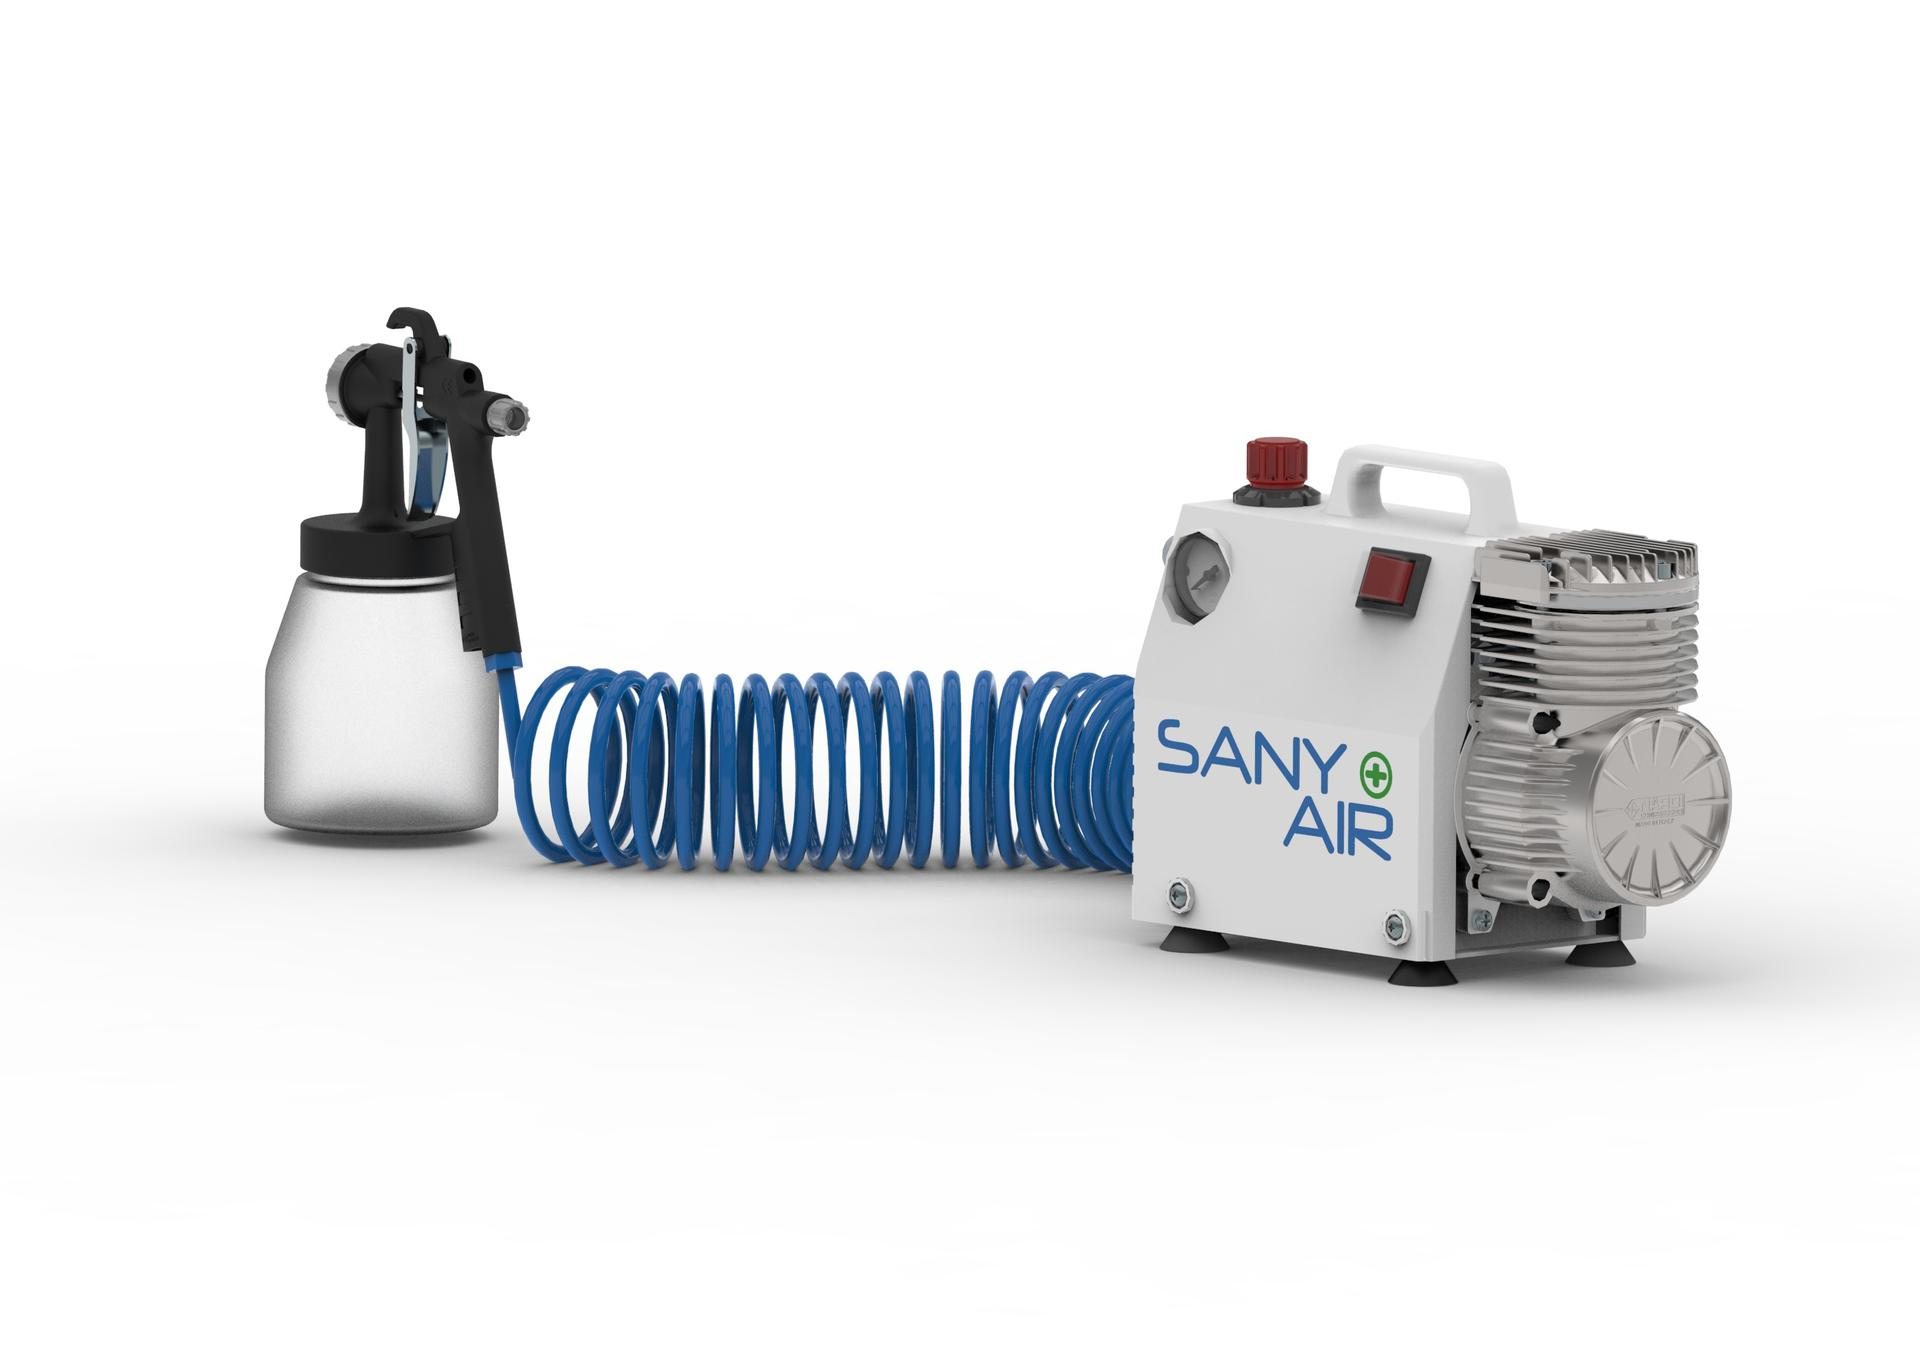 SANY-AIR desoaparaat Image